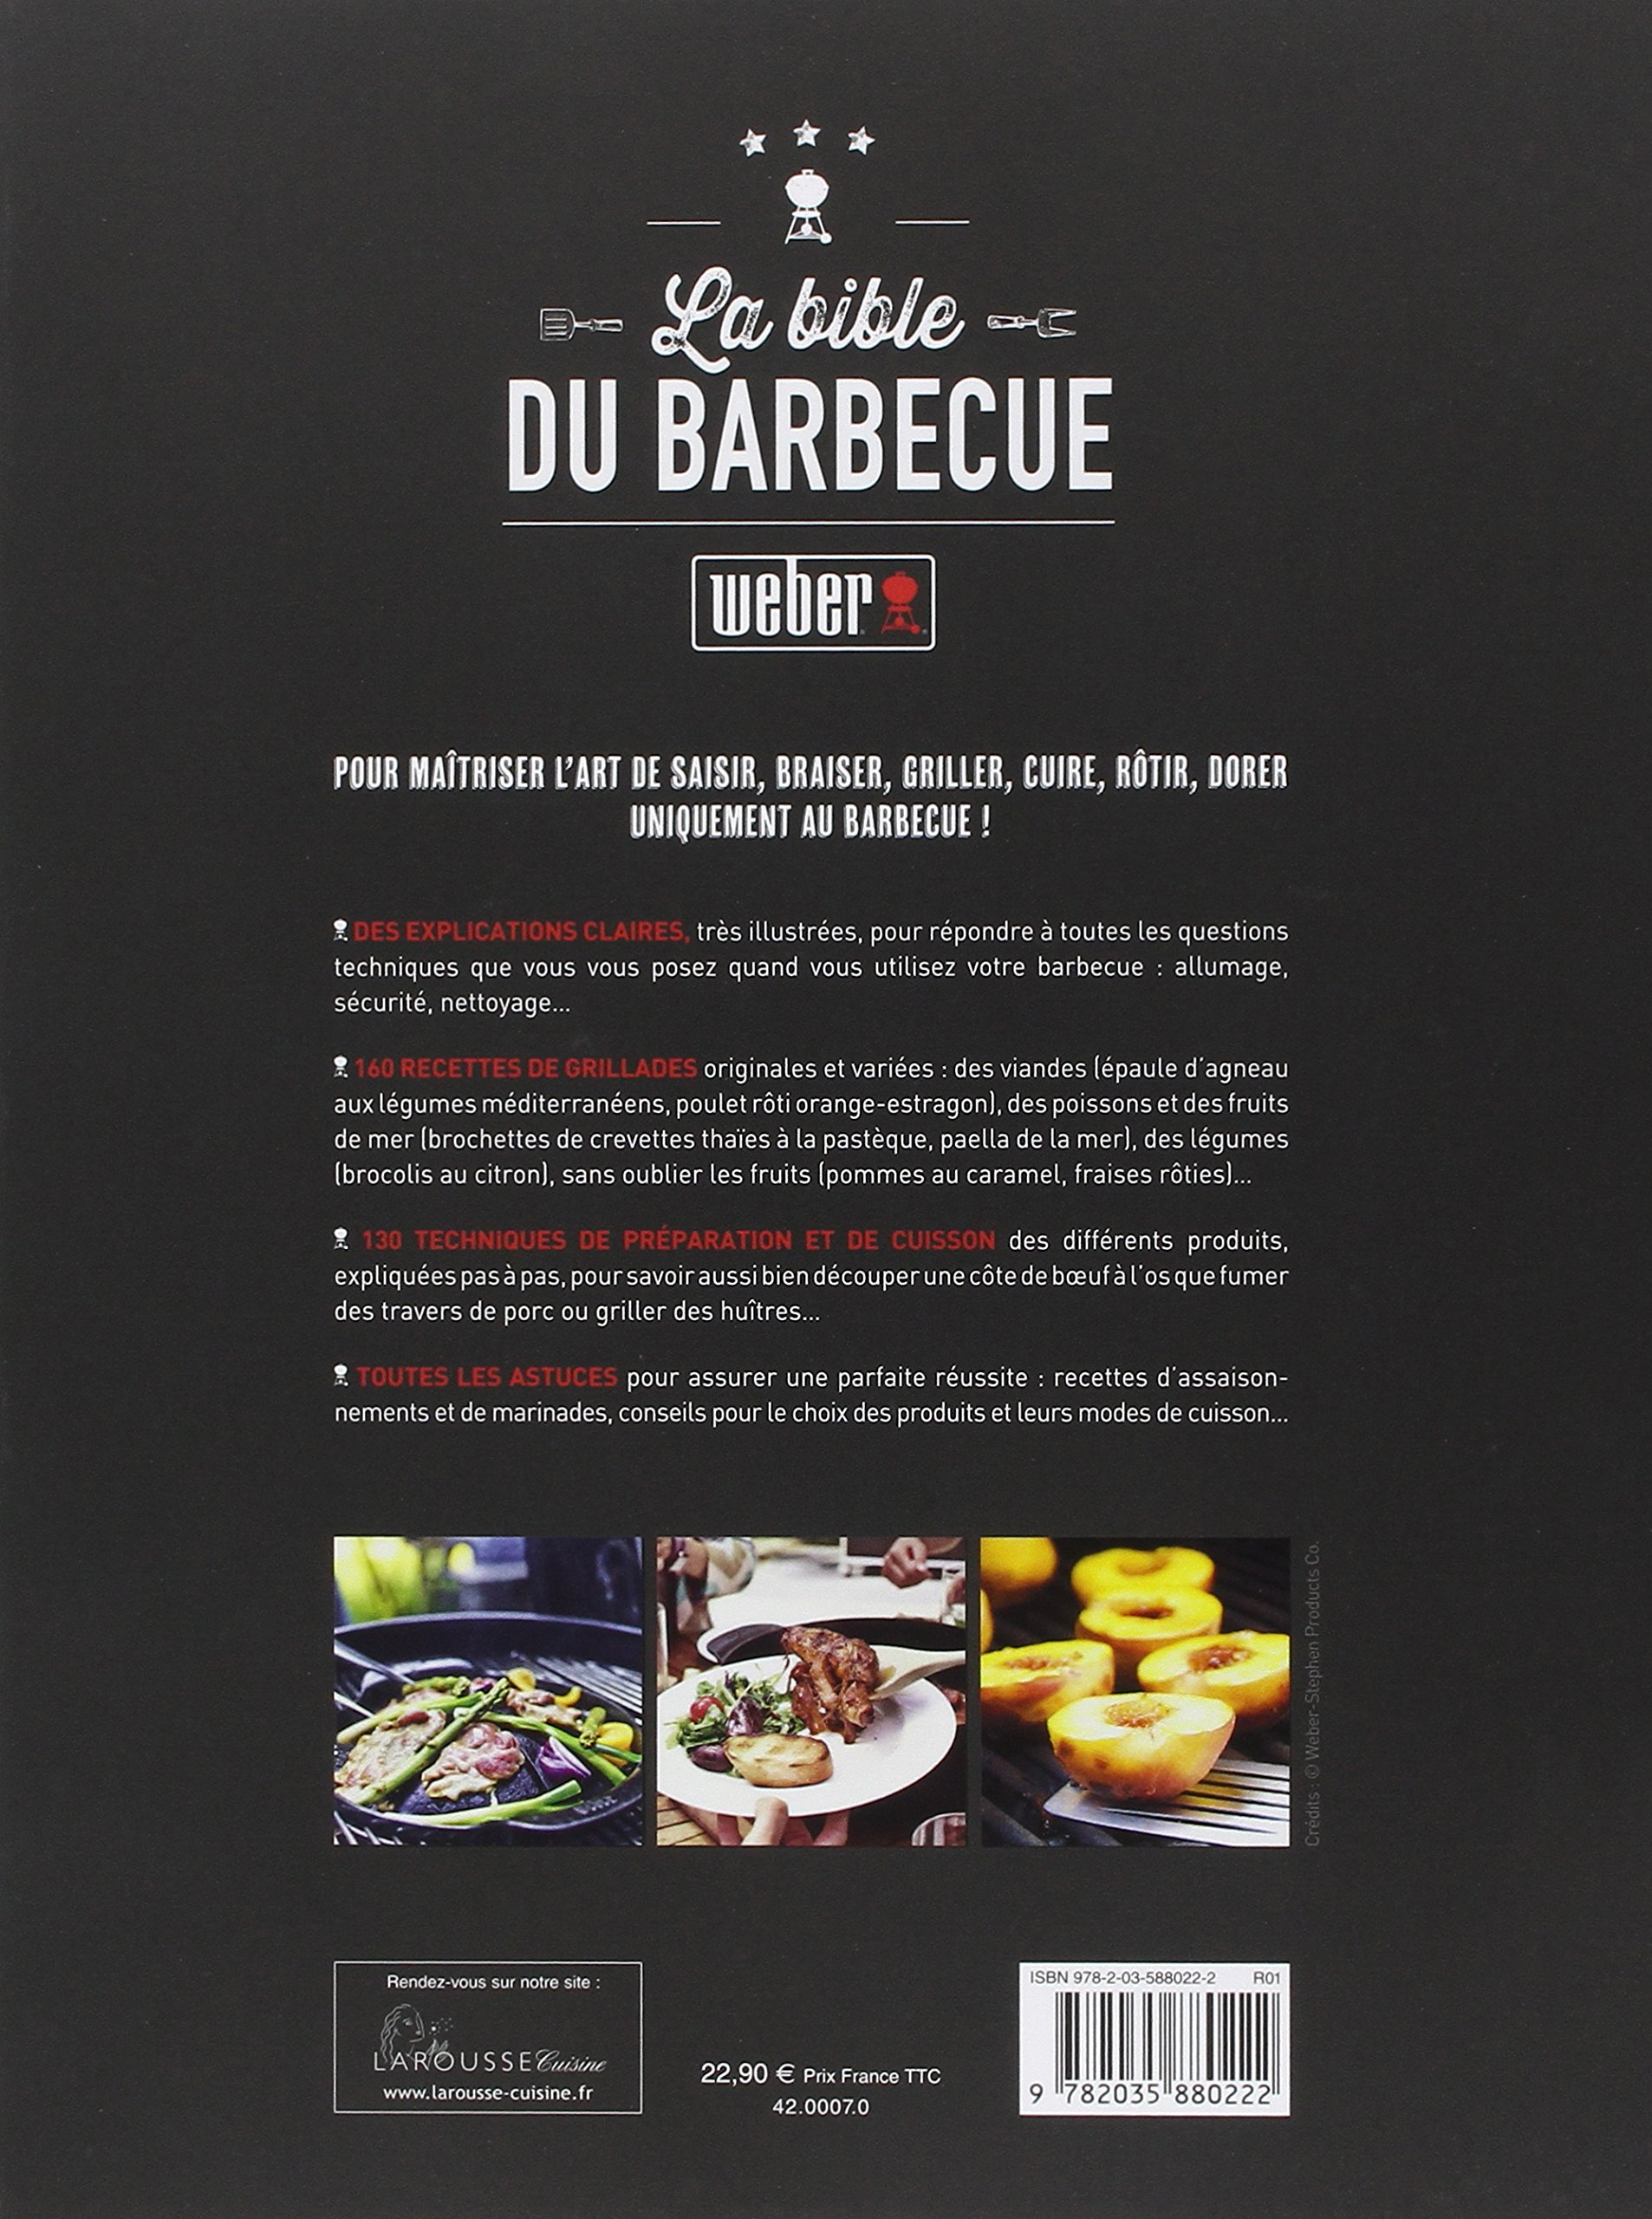 WRG-3209] La Bible Du Barbecue Nouvelle Presentation on